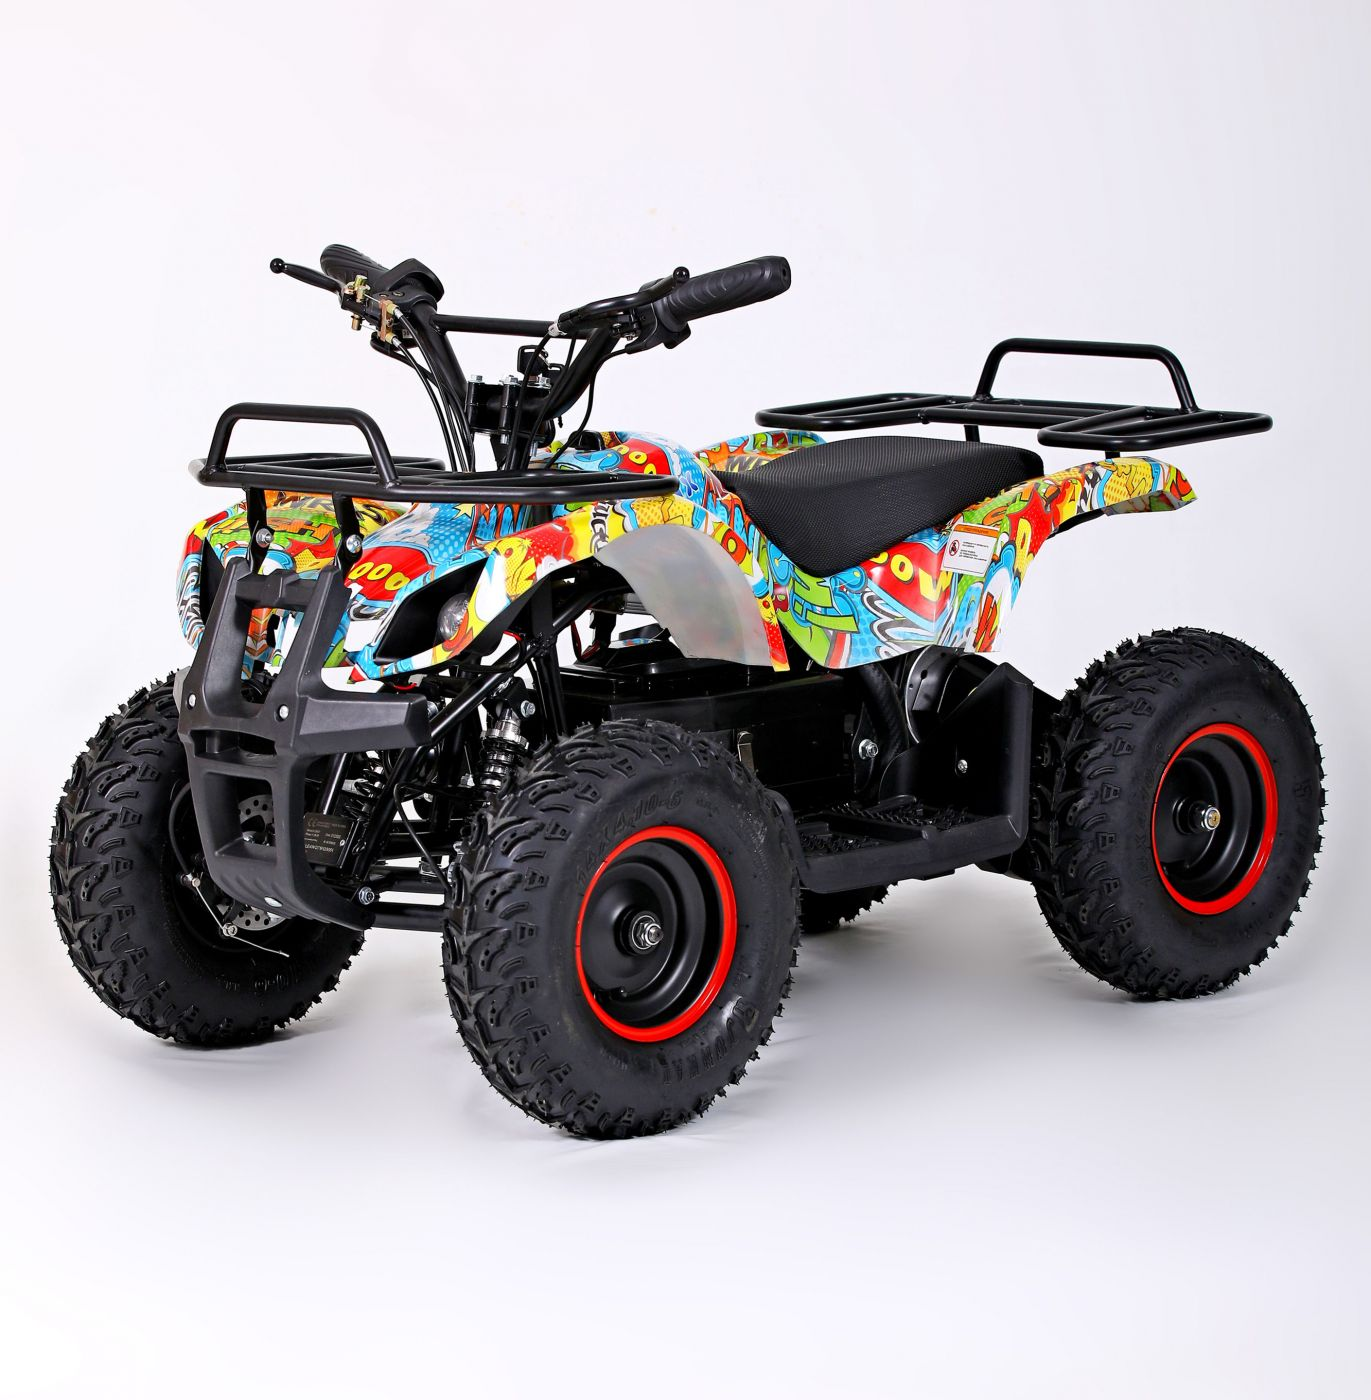 MOTAX Mini Grizlik Х-16 BIG WHEEL 1000W Электроквадроцикл